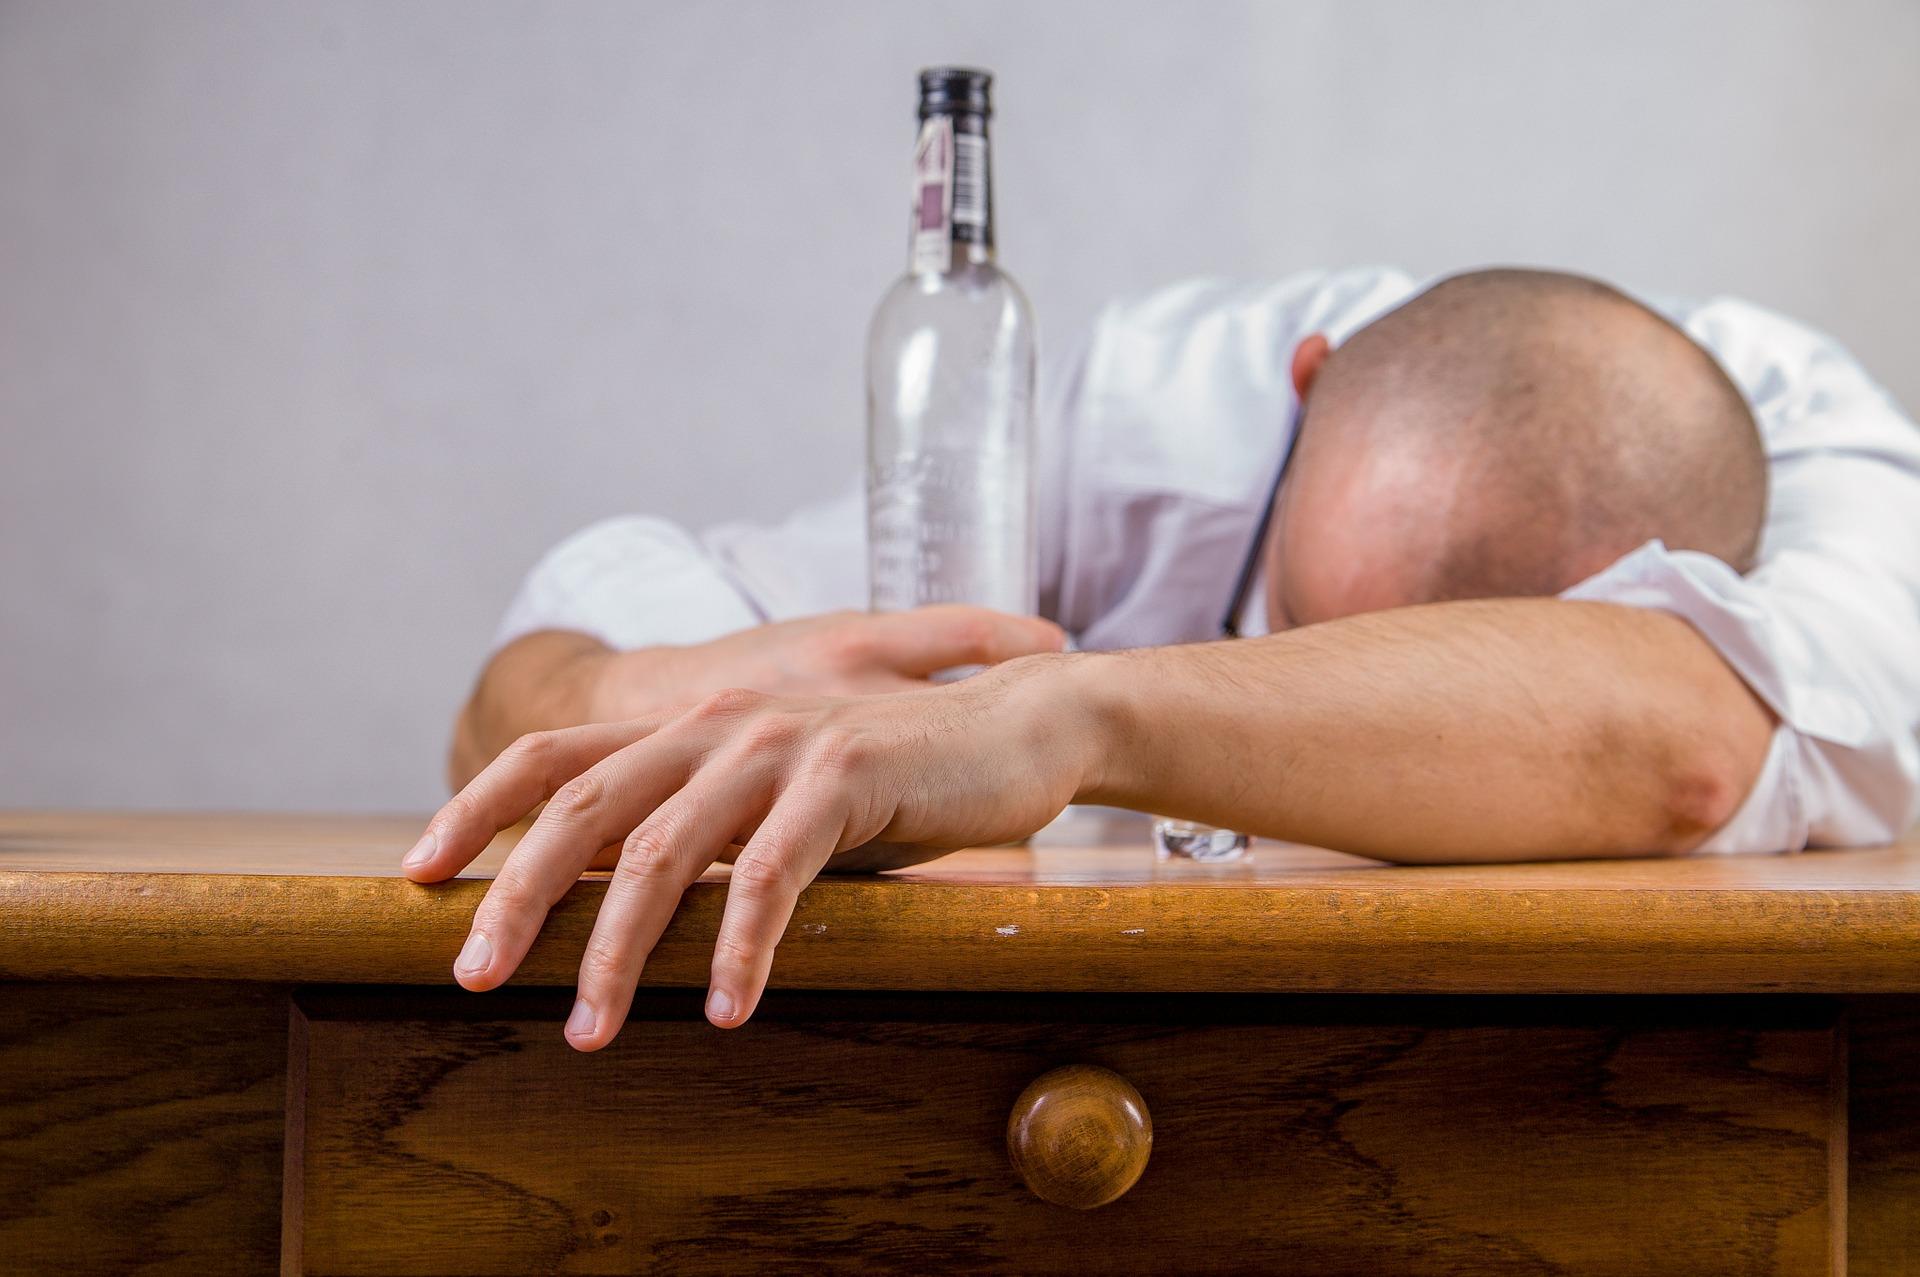 alcohol-428392_1920